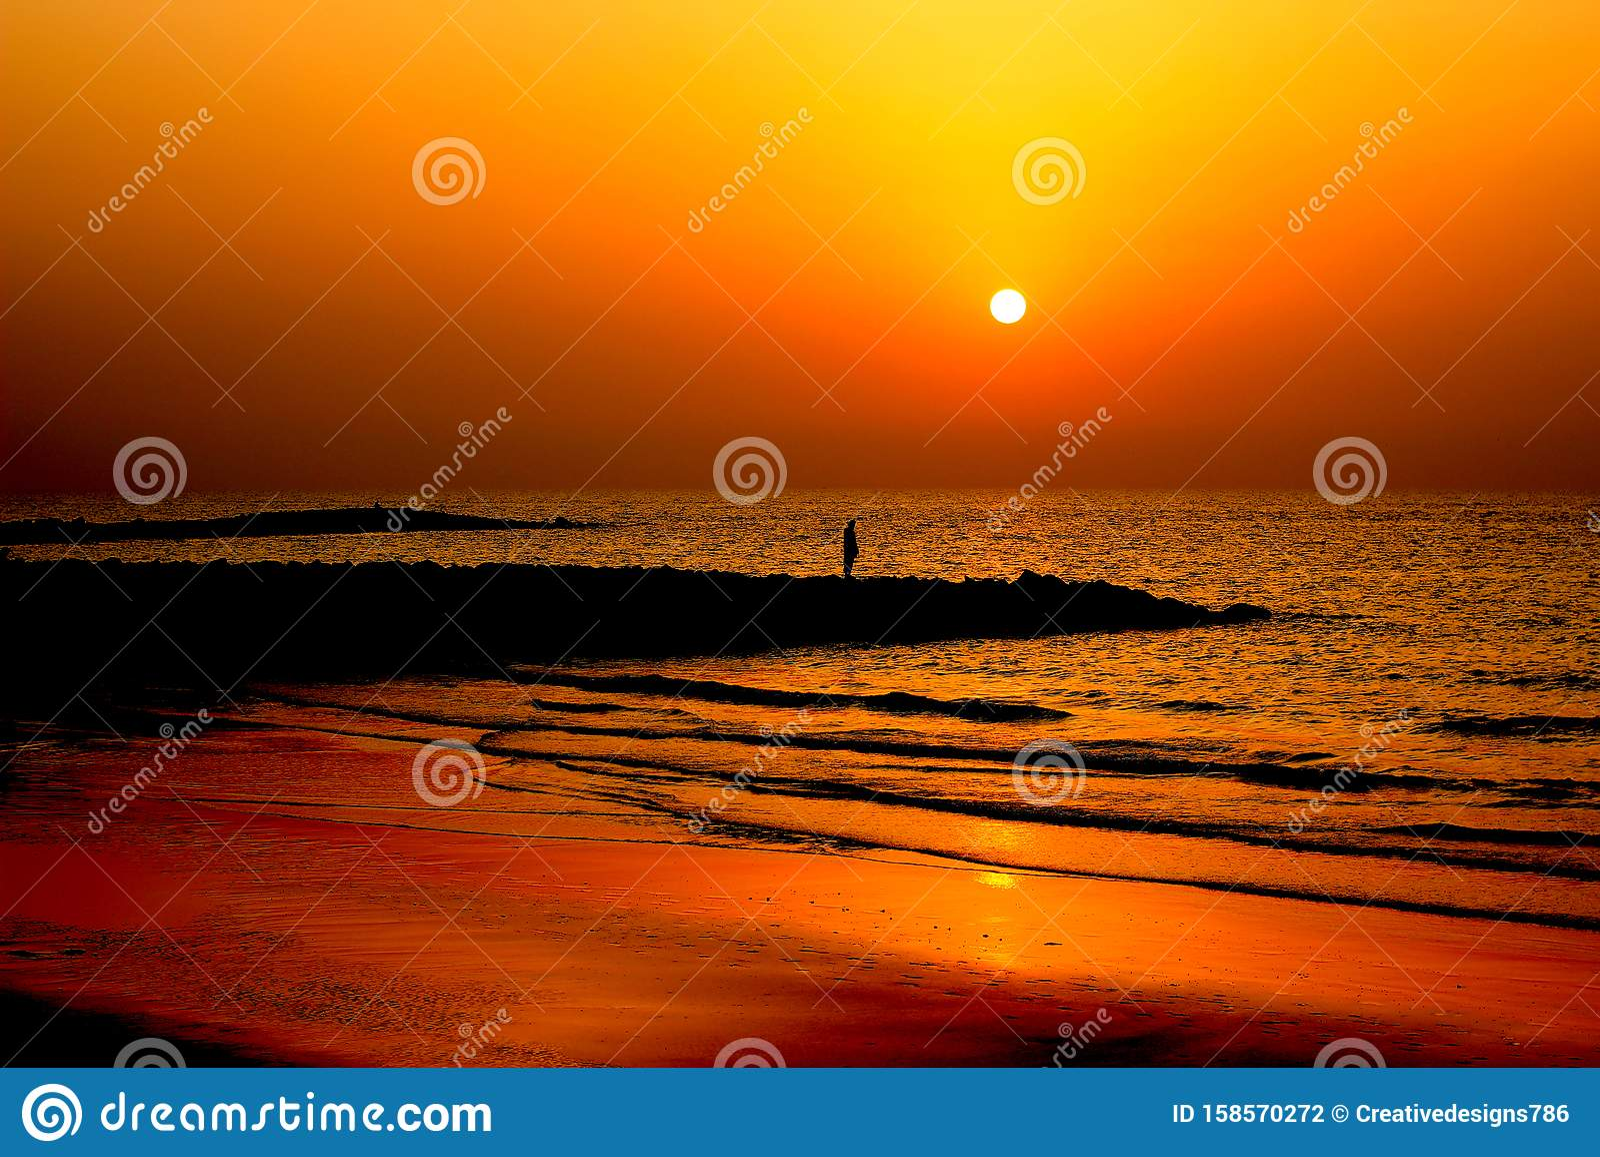 colorful ocean beach sunrise wallpaper backgrounds sunset ocean wallpaper backgrounds view 158570272